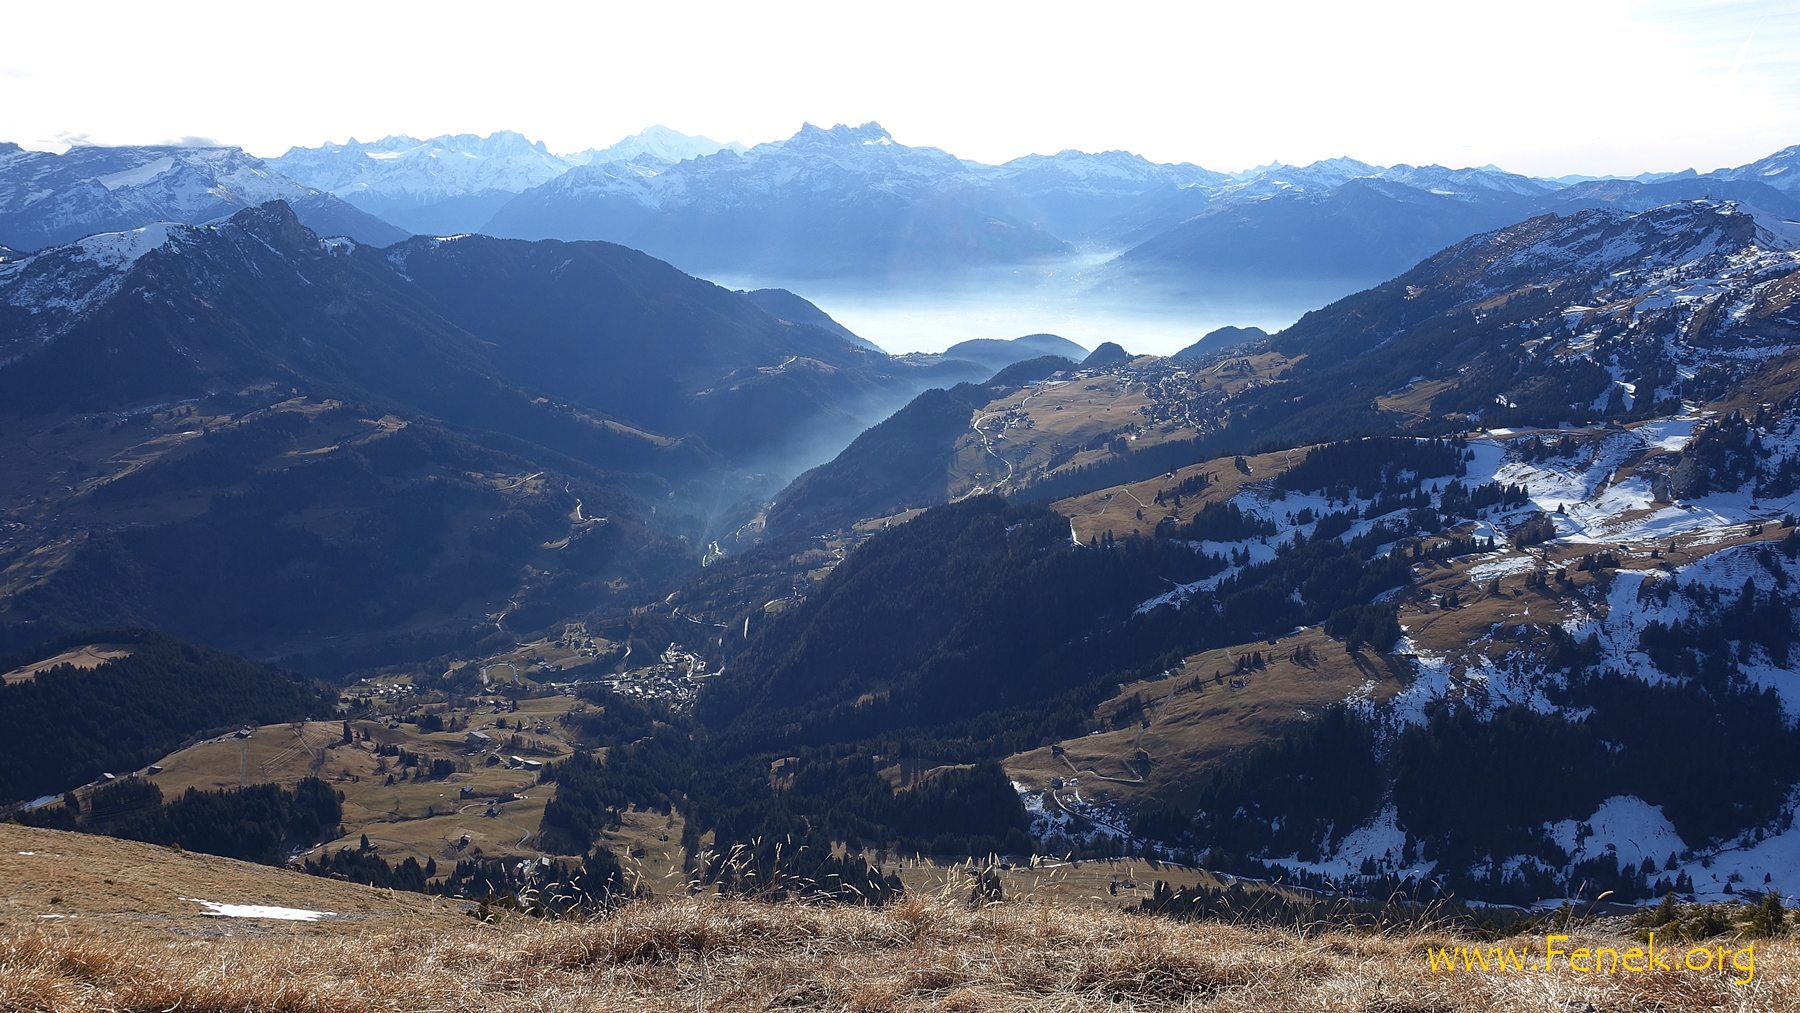 Richtung Unterwallis - Dents du Midi - Mont Blanc etc....